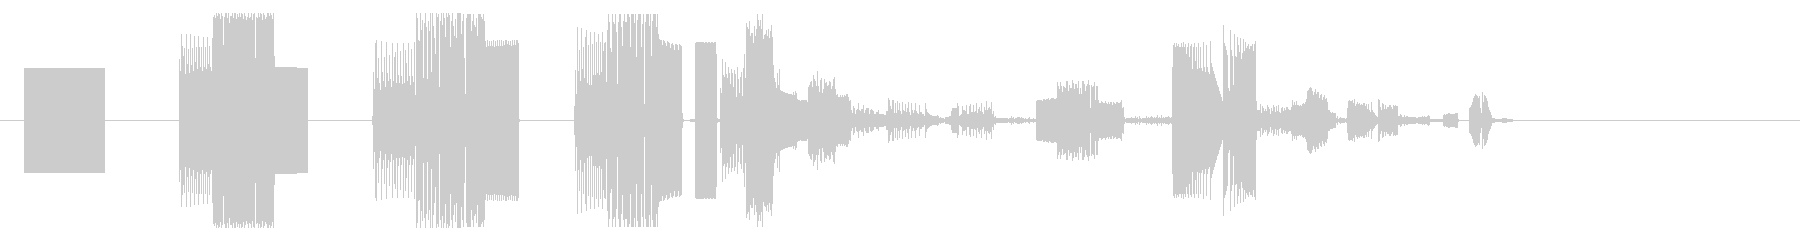 KANT8bit効果音082445の未再生の波形